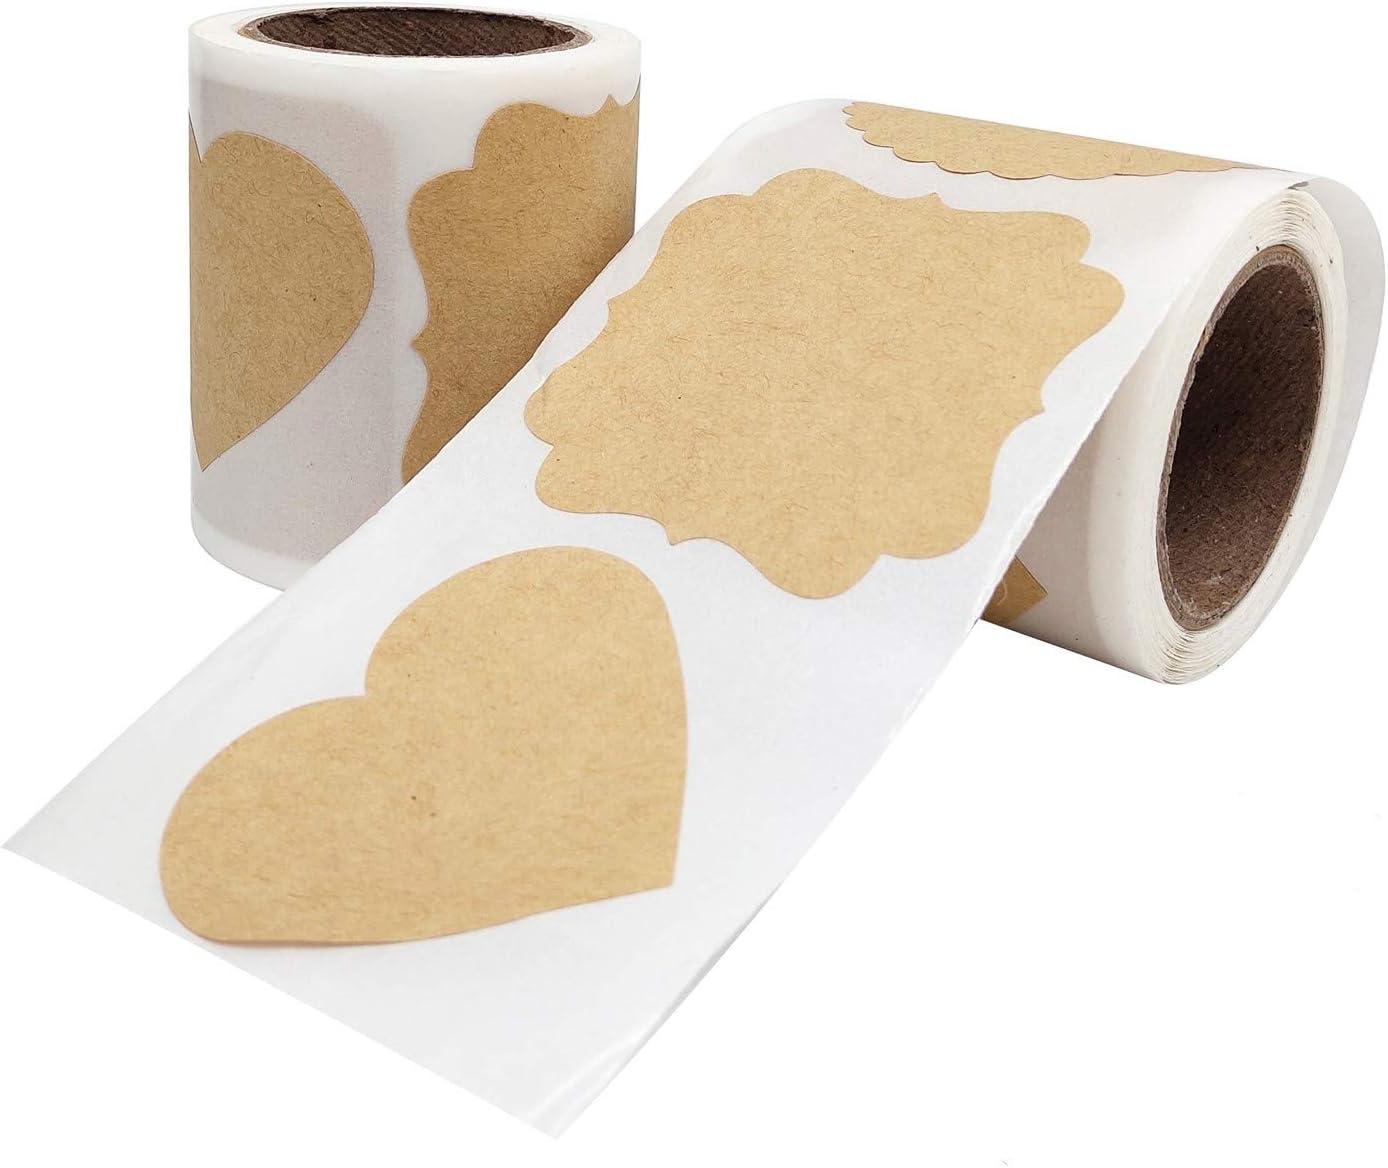 Marrone Etichette da Cucina Kraft di Carta per vasetti di conservazione Vasetti per spezie JJ QHYC Etichette Adesive kraft 200 pezzi